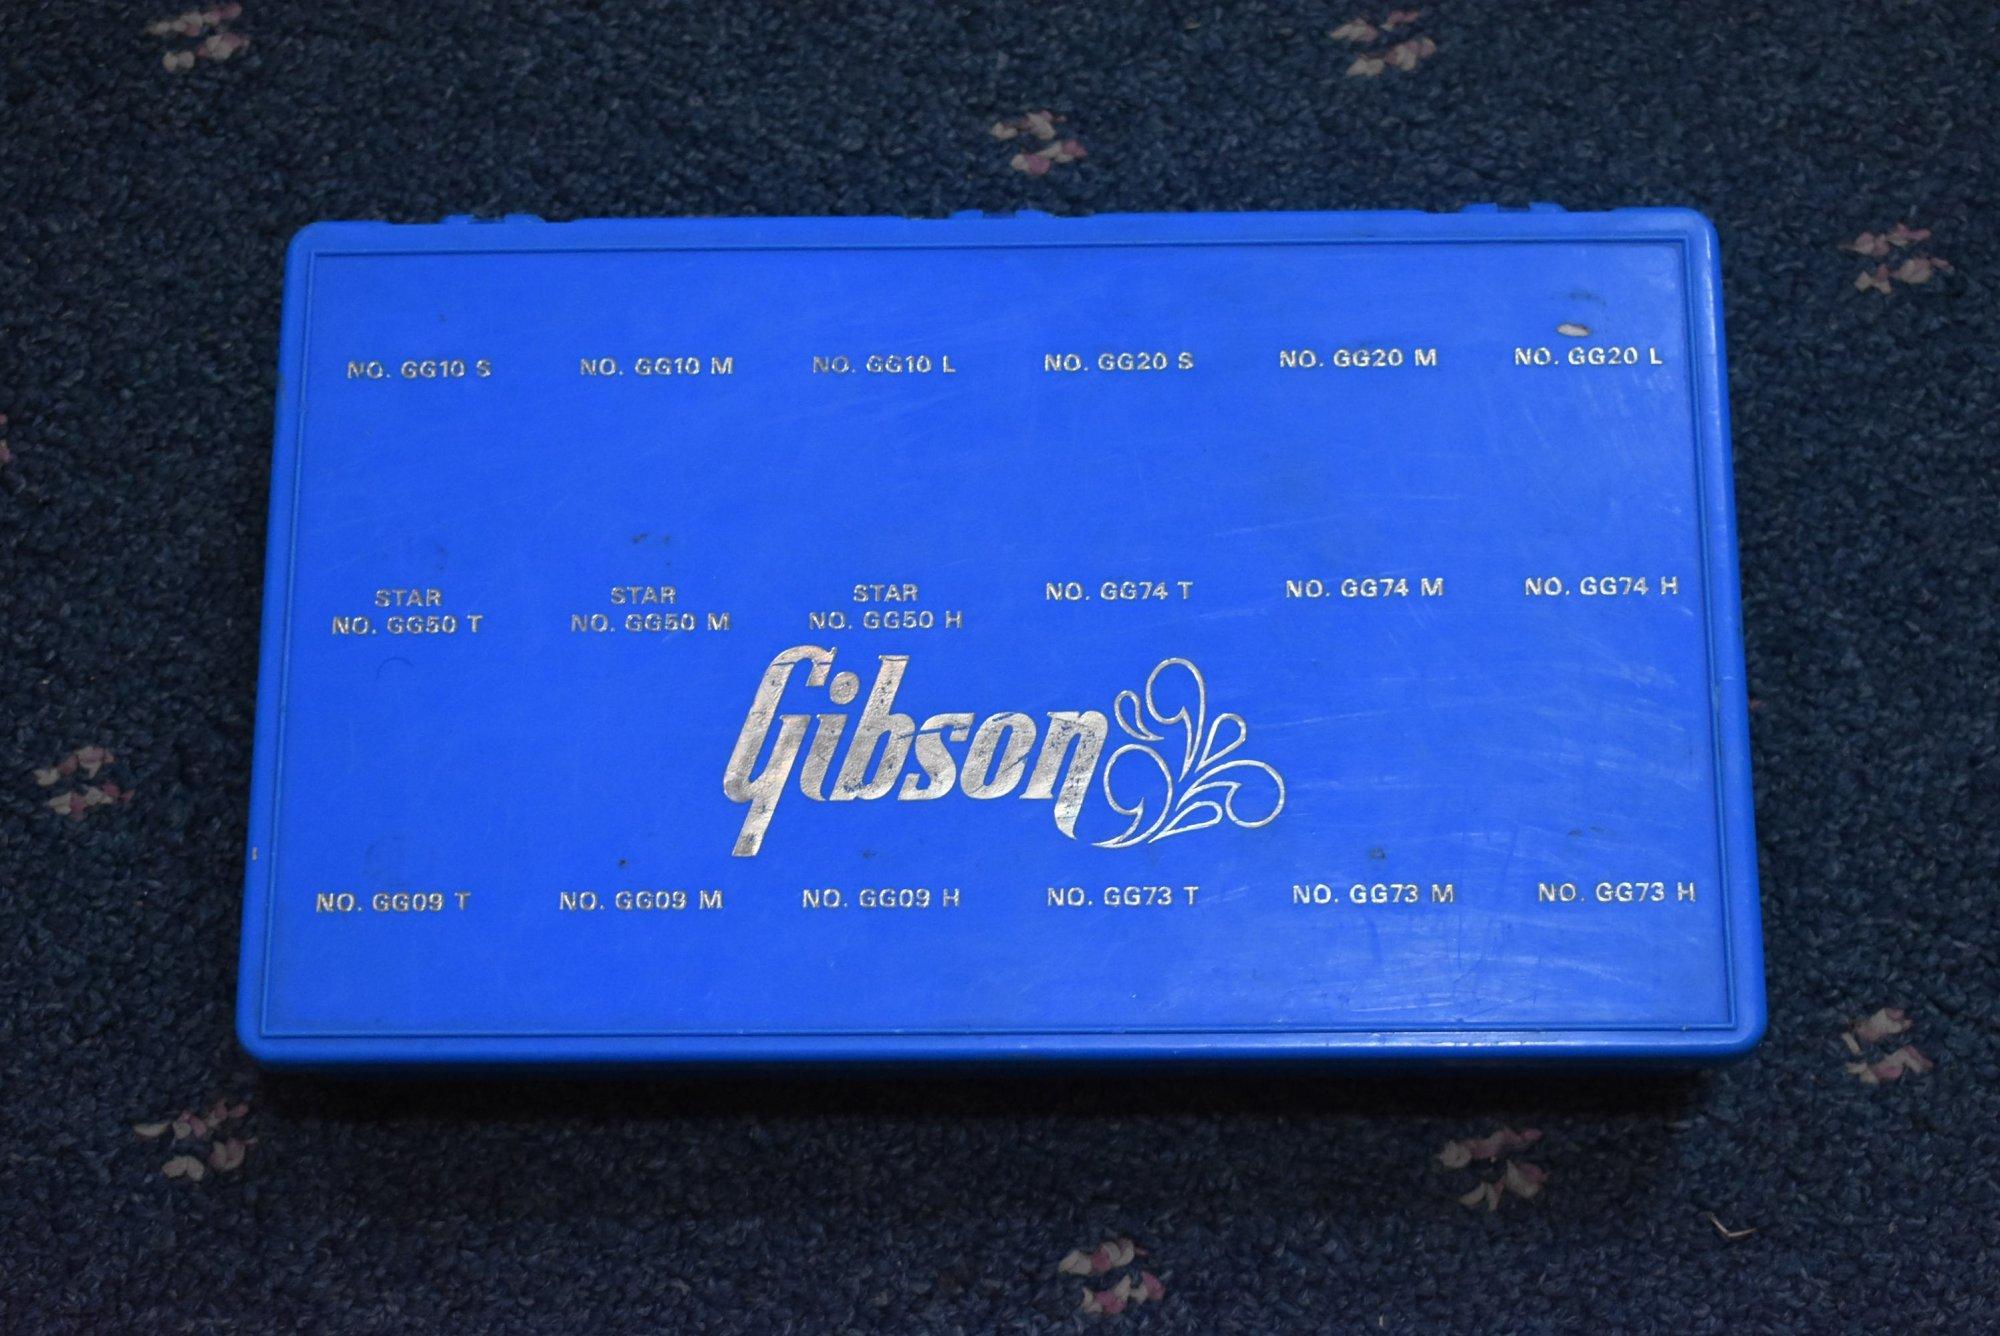 Gibson Guitar Picks Display Box 1970s